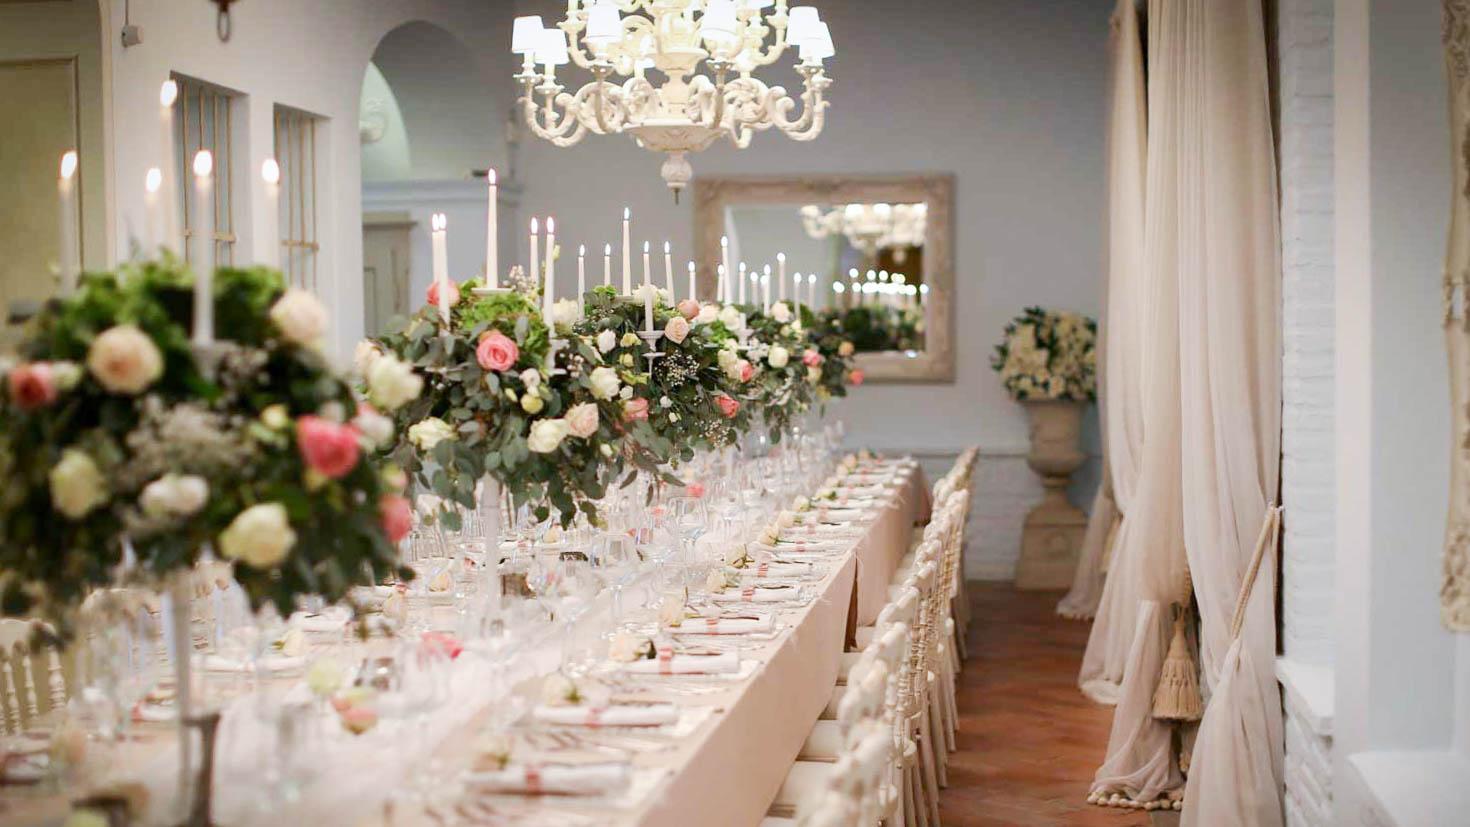 Matrimonio Tra Gli Ulivi Toscana : Sale per matrimoni toscana sale per matrimoni firenze sale per